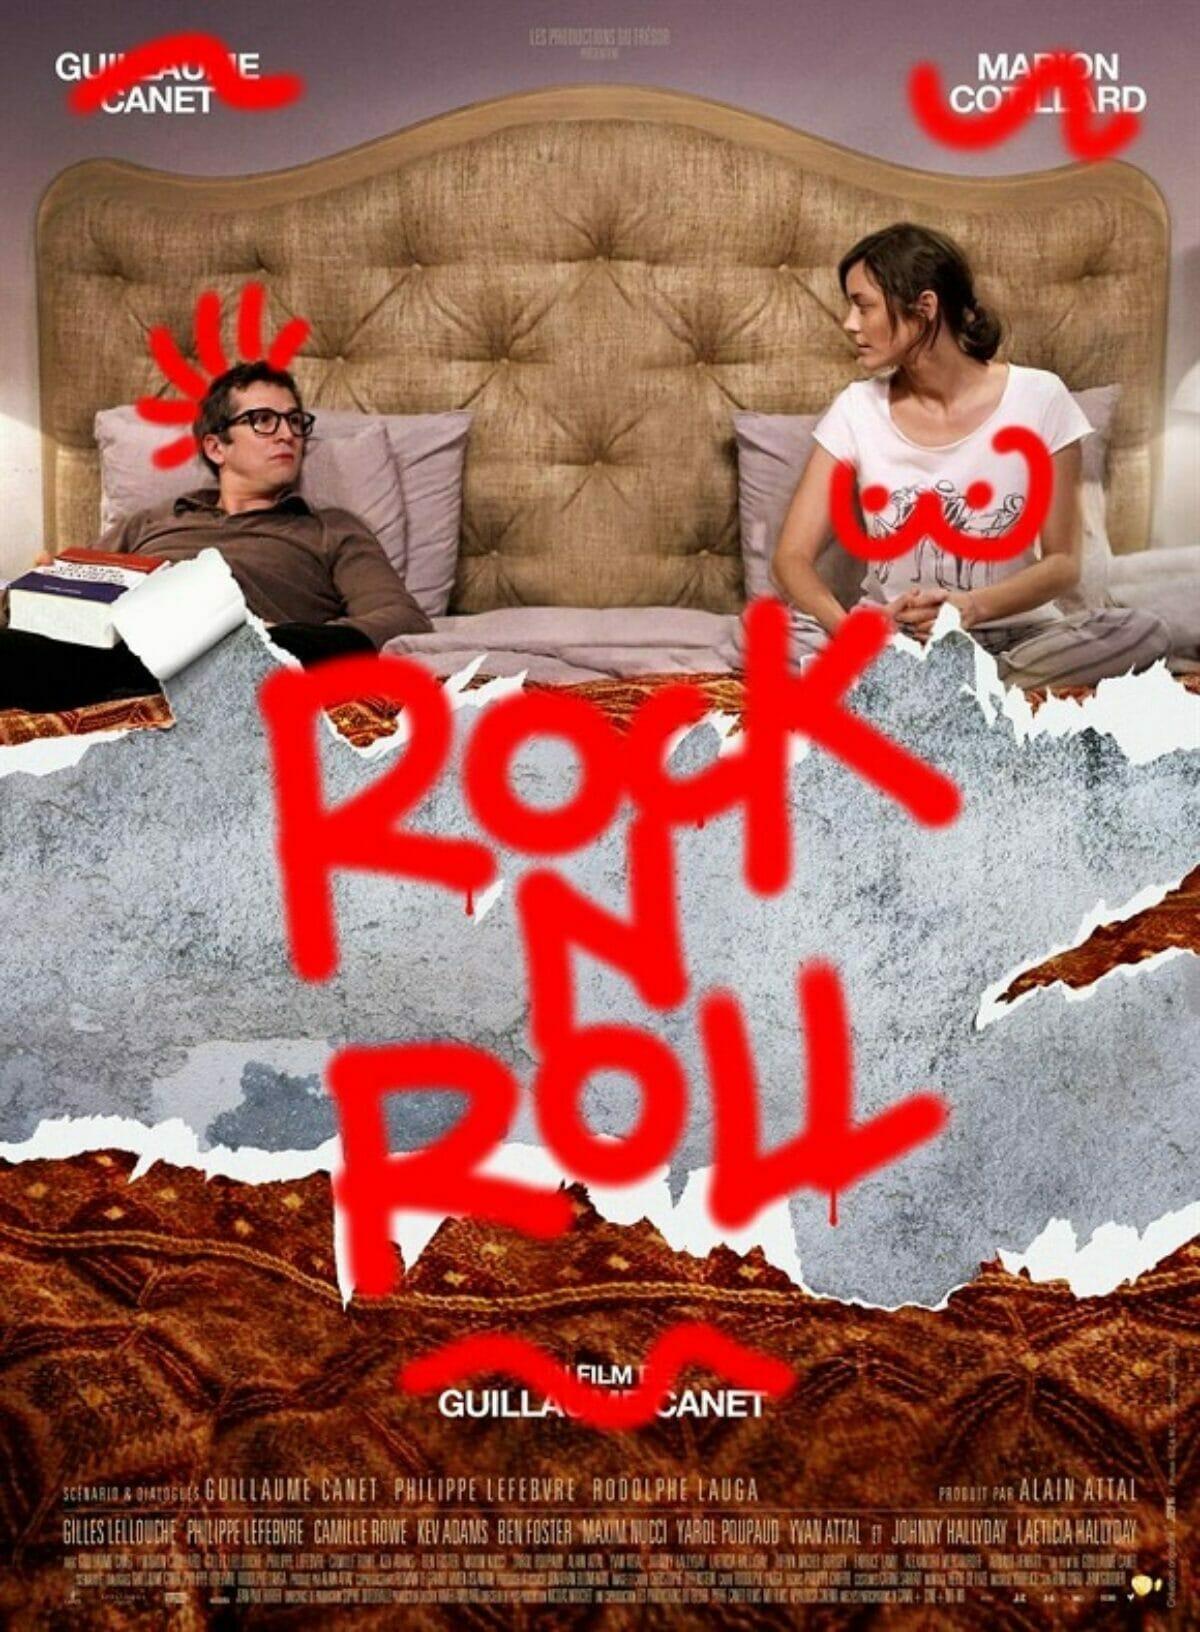 Rock-n-roll-poster